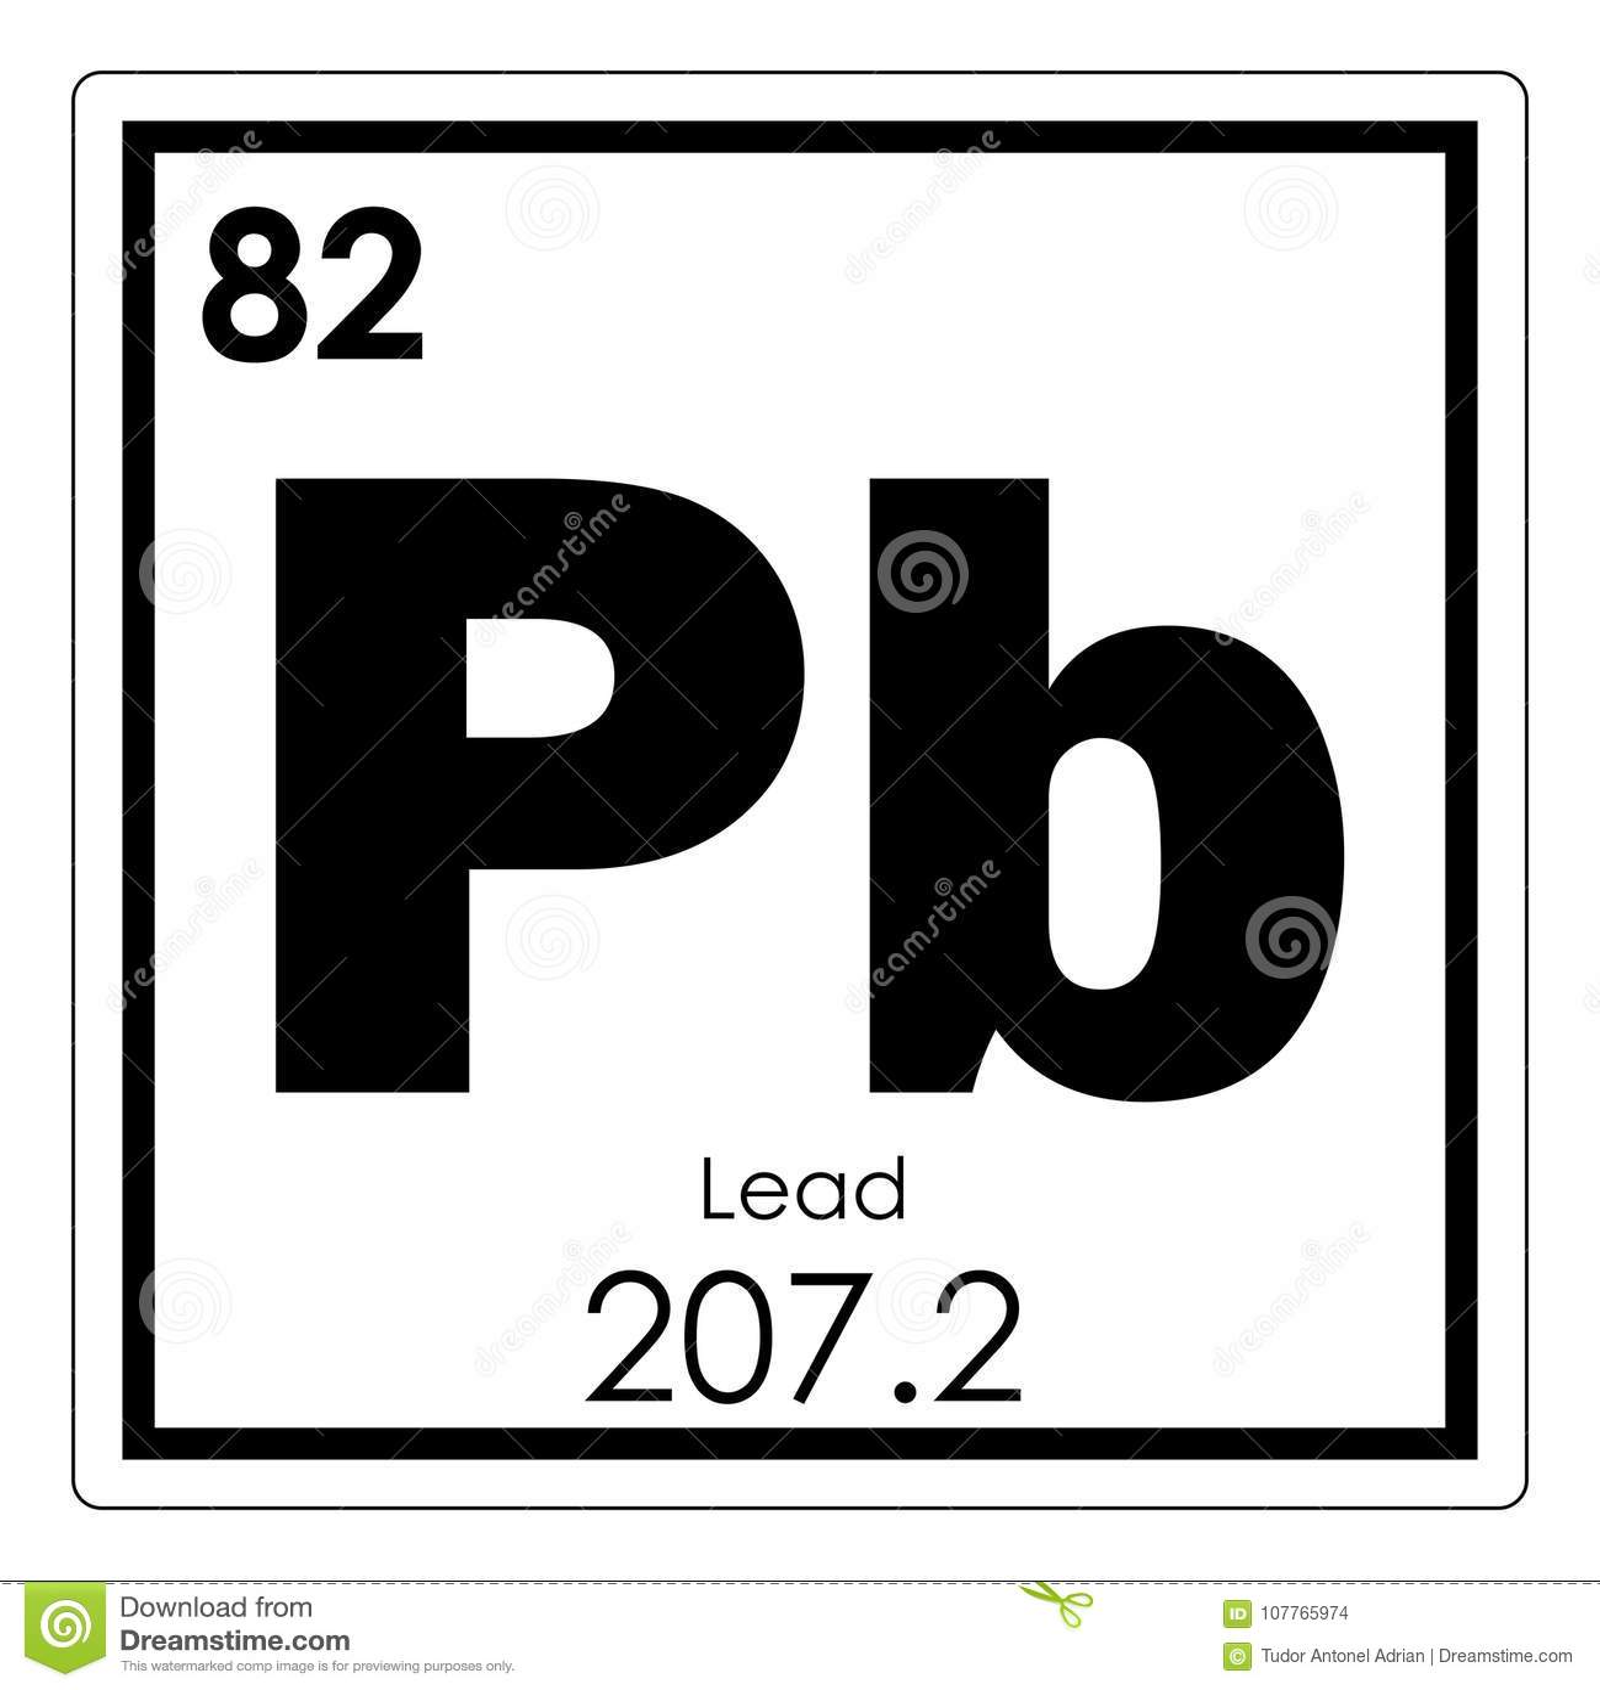 Lead Chemical Element Stock Illustration Illustration Of Atom